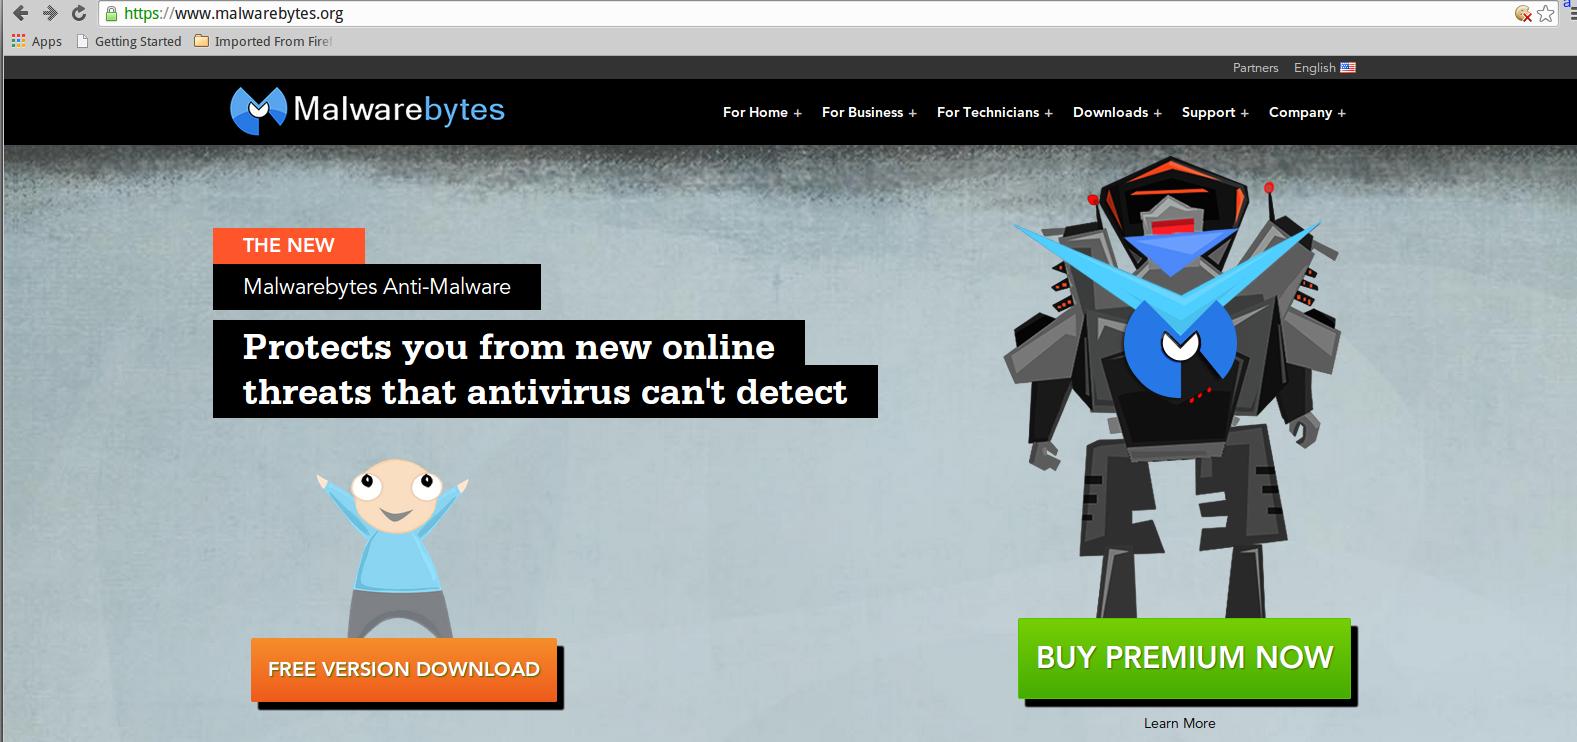 Why Malwarebytes Anti-Malware is the Best Choice - Ophtek